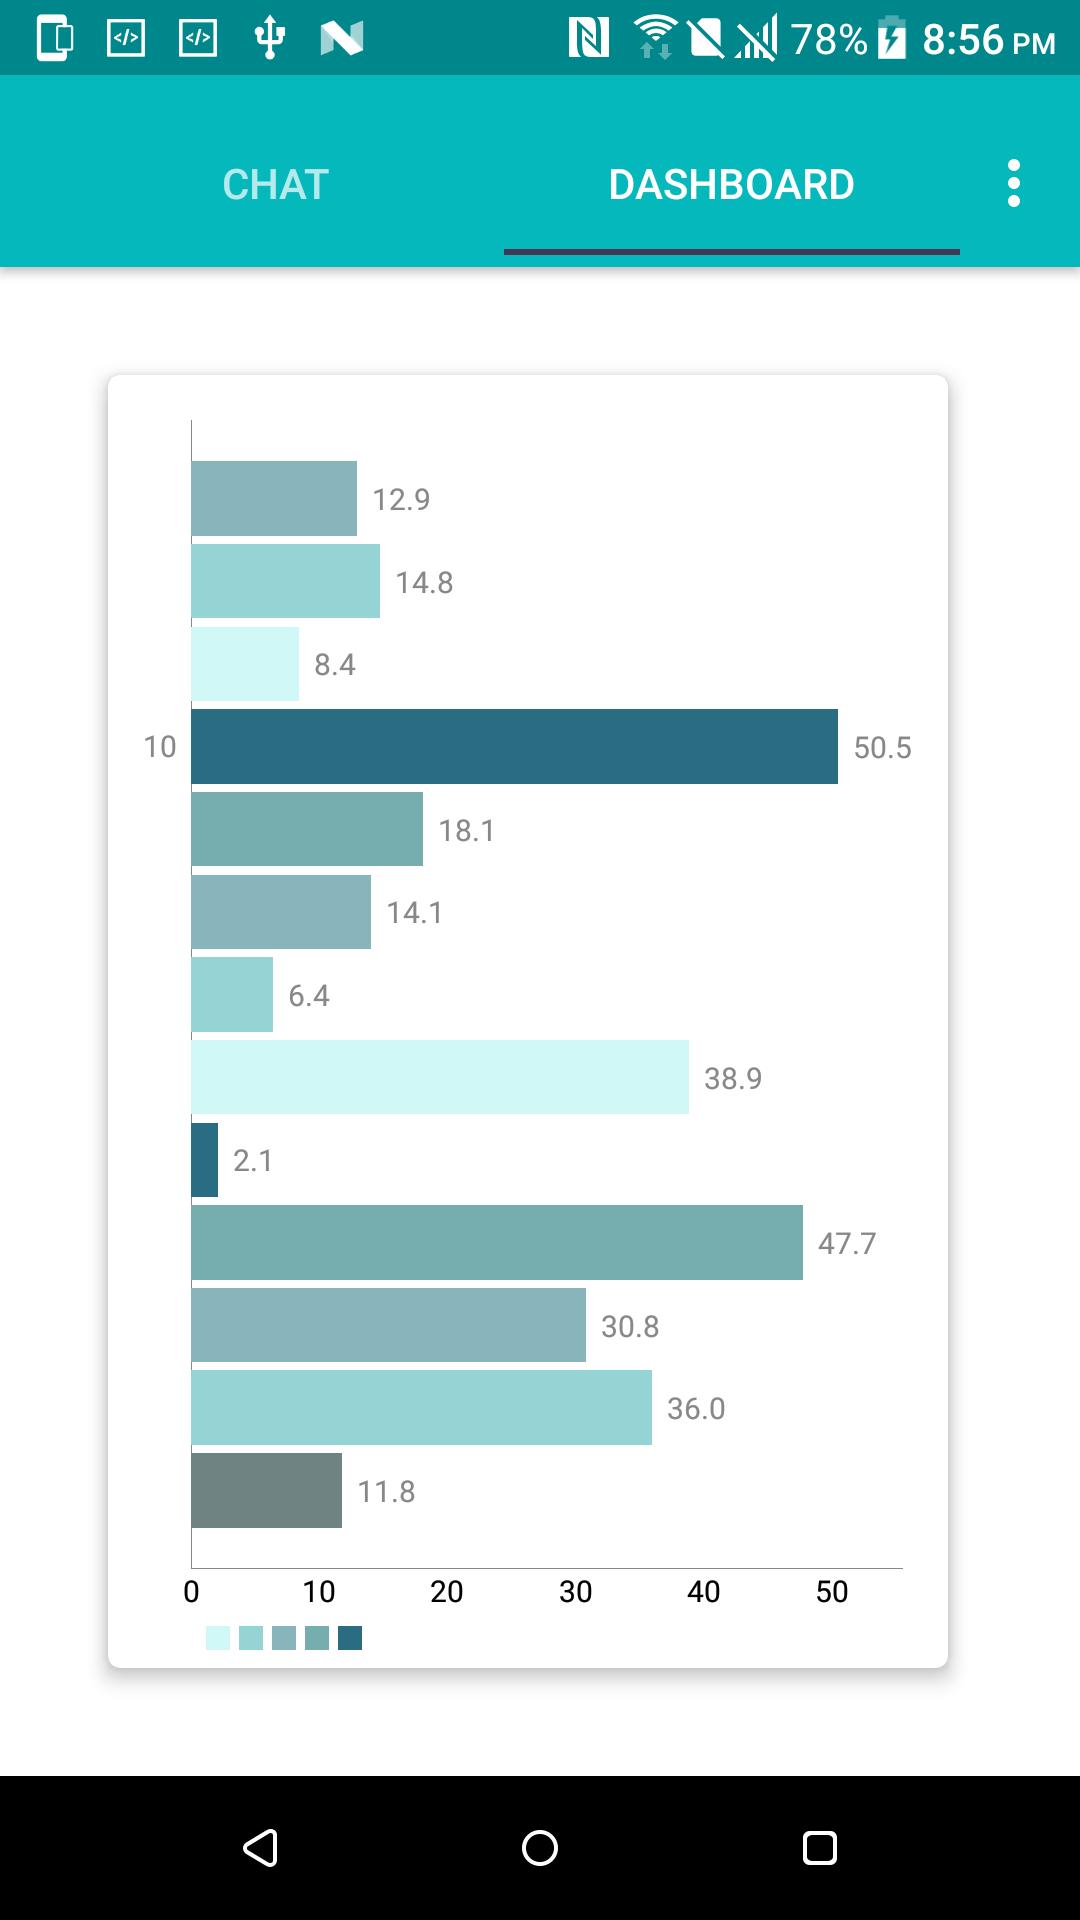 GitHub - VidyaSastry/Opal-Chat-AnalyticsDashboard: An